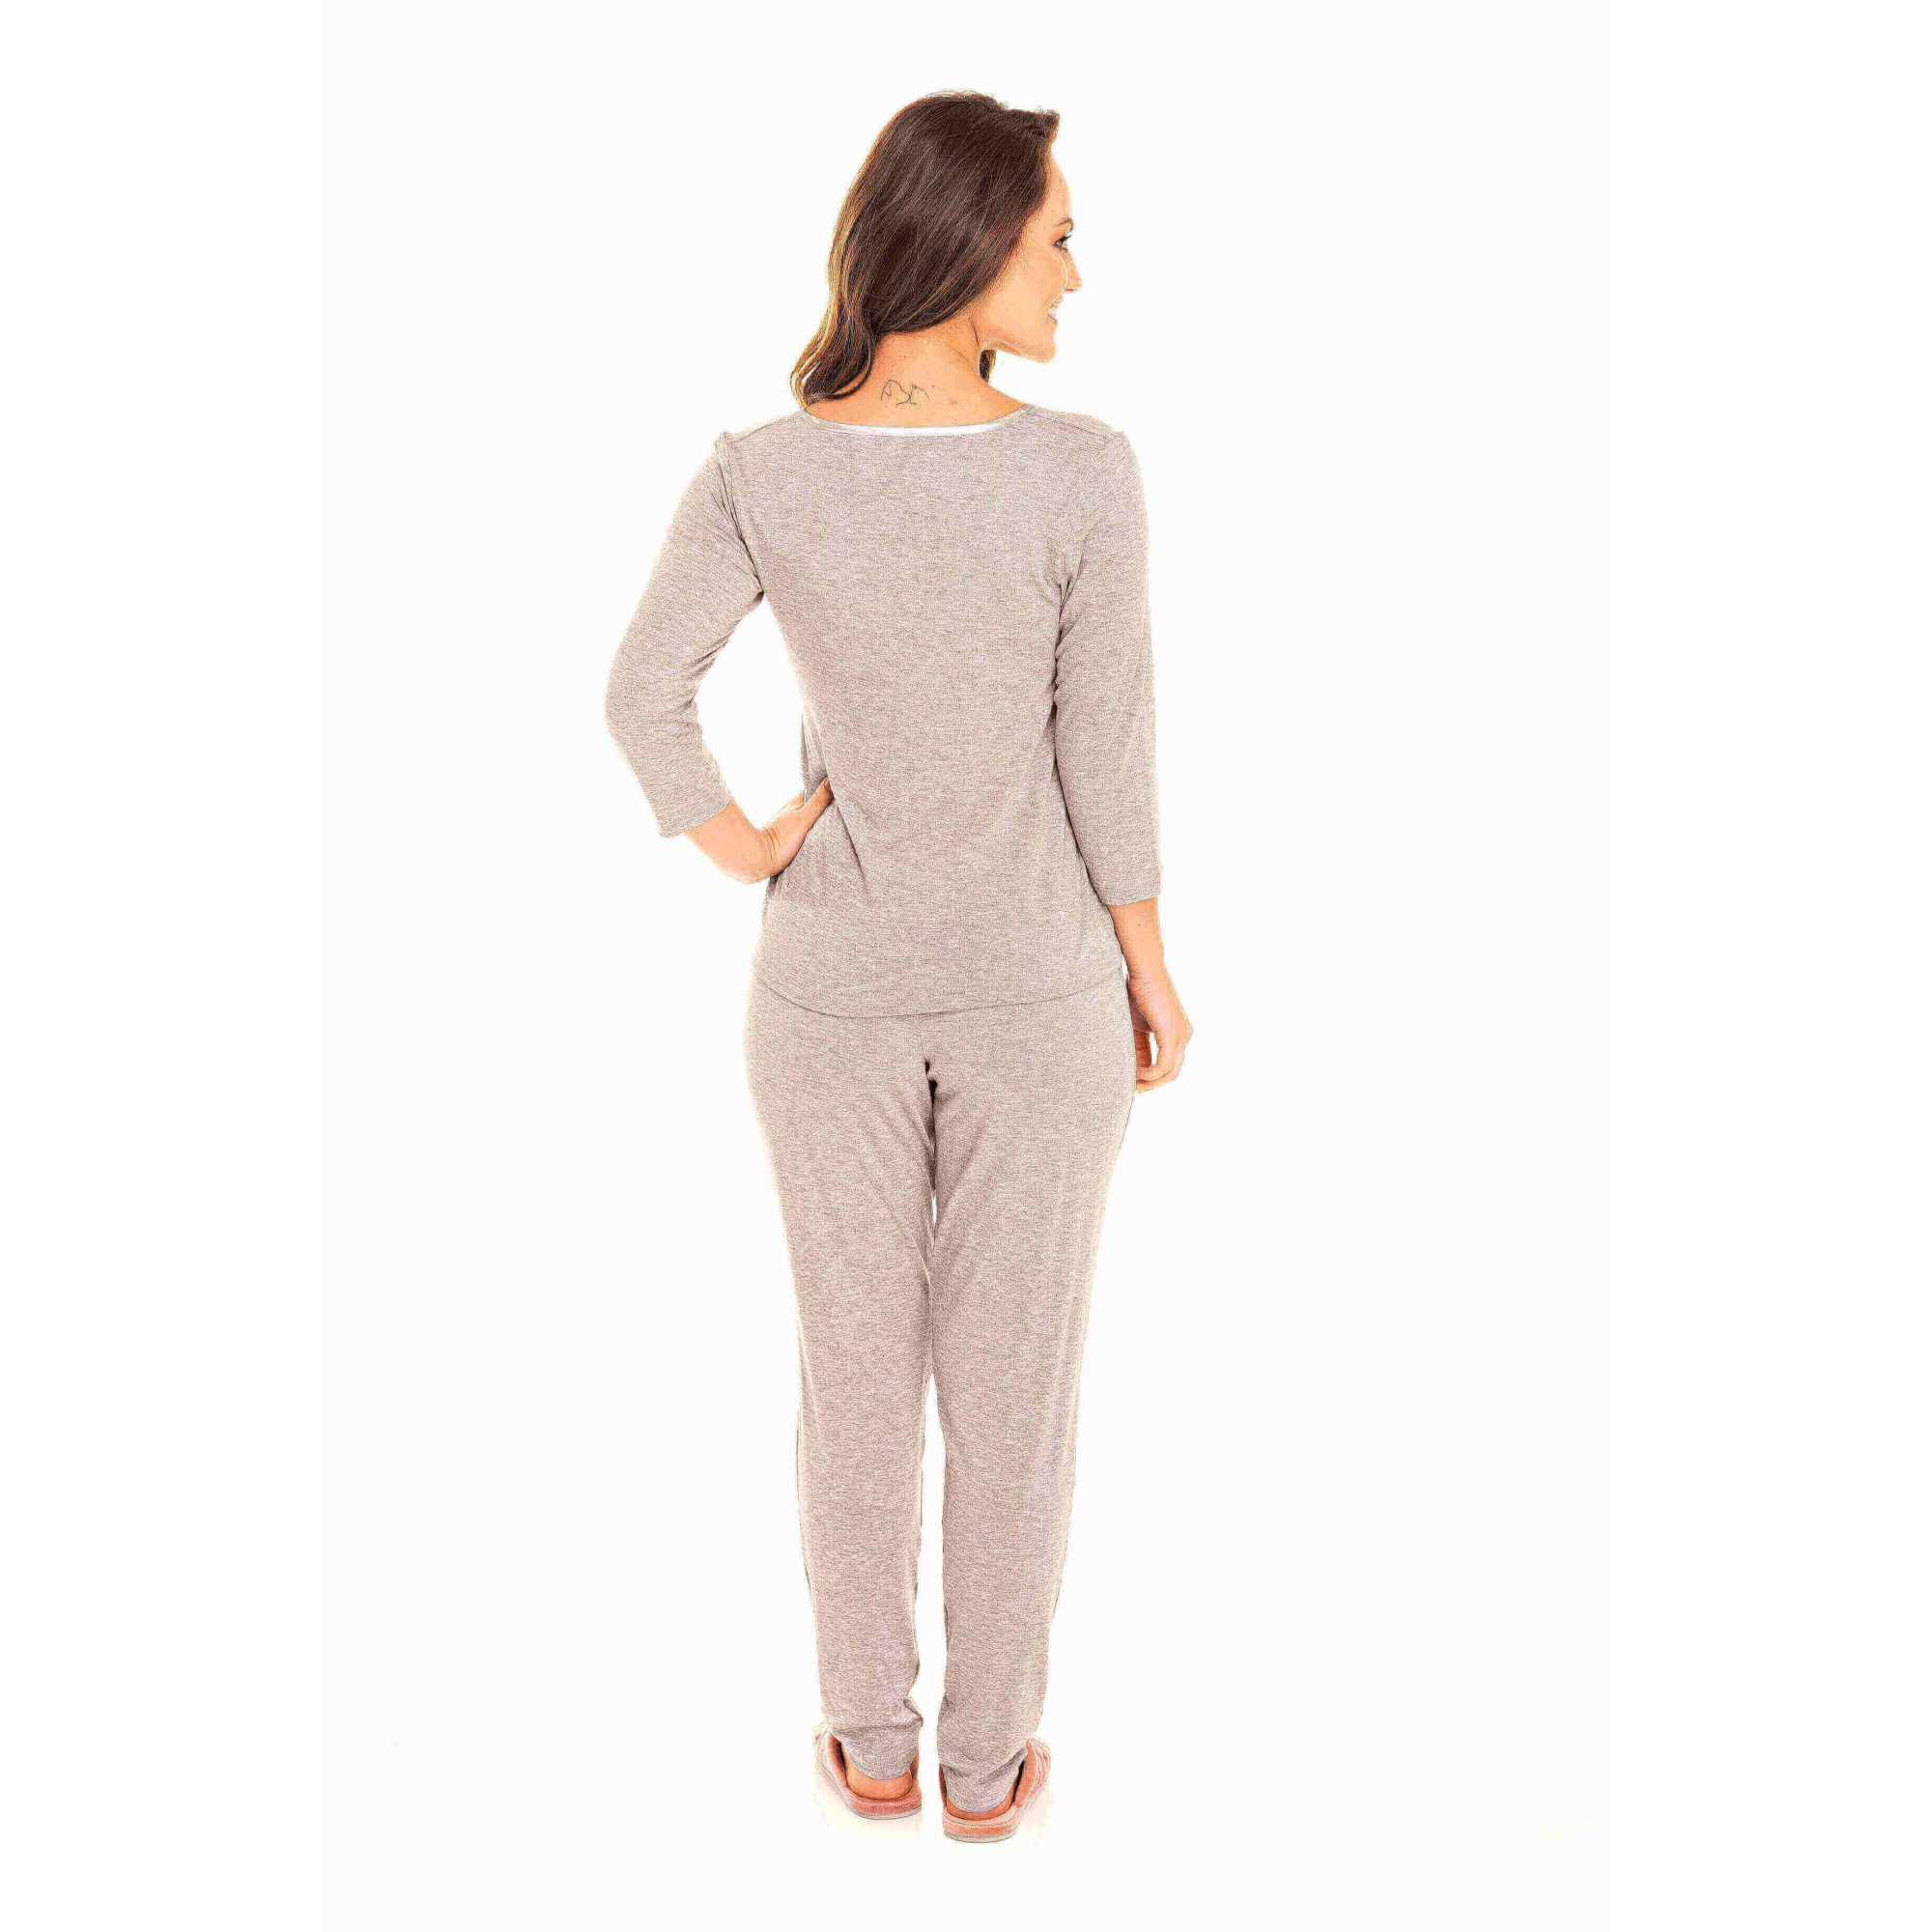 Pijama Adulto Feminino Glamour Mescla